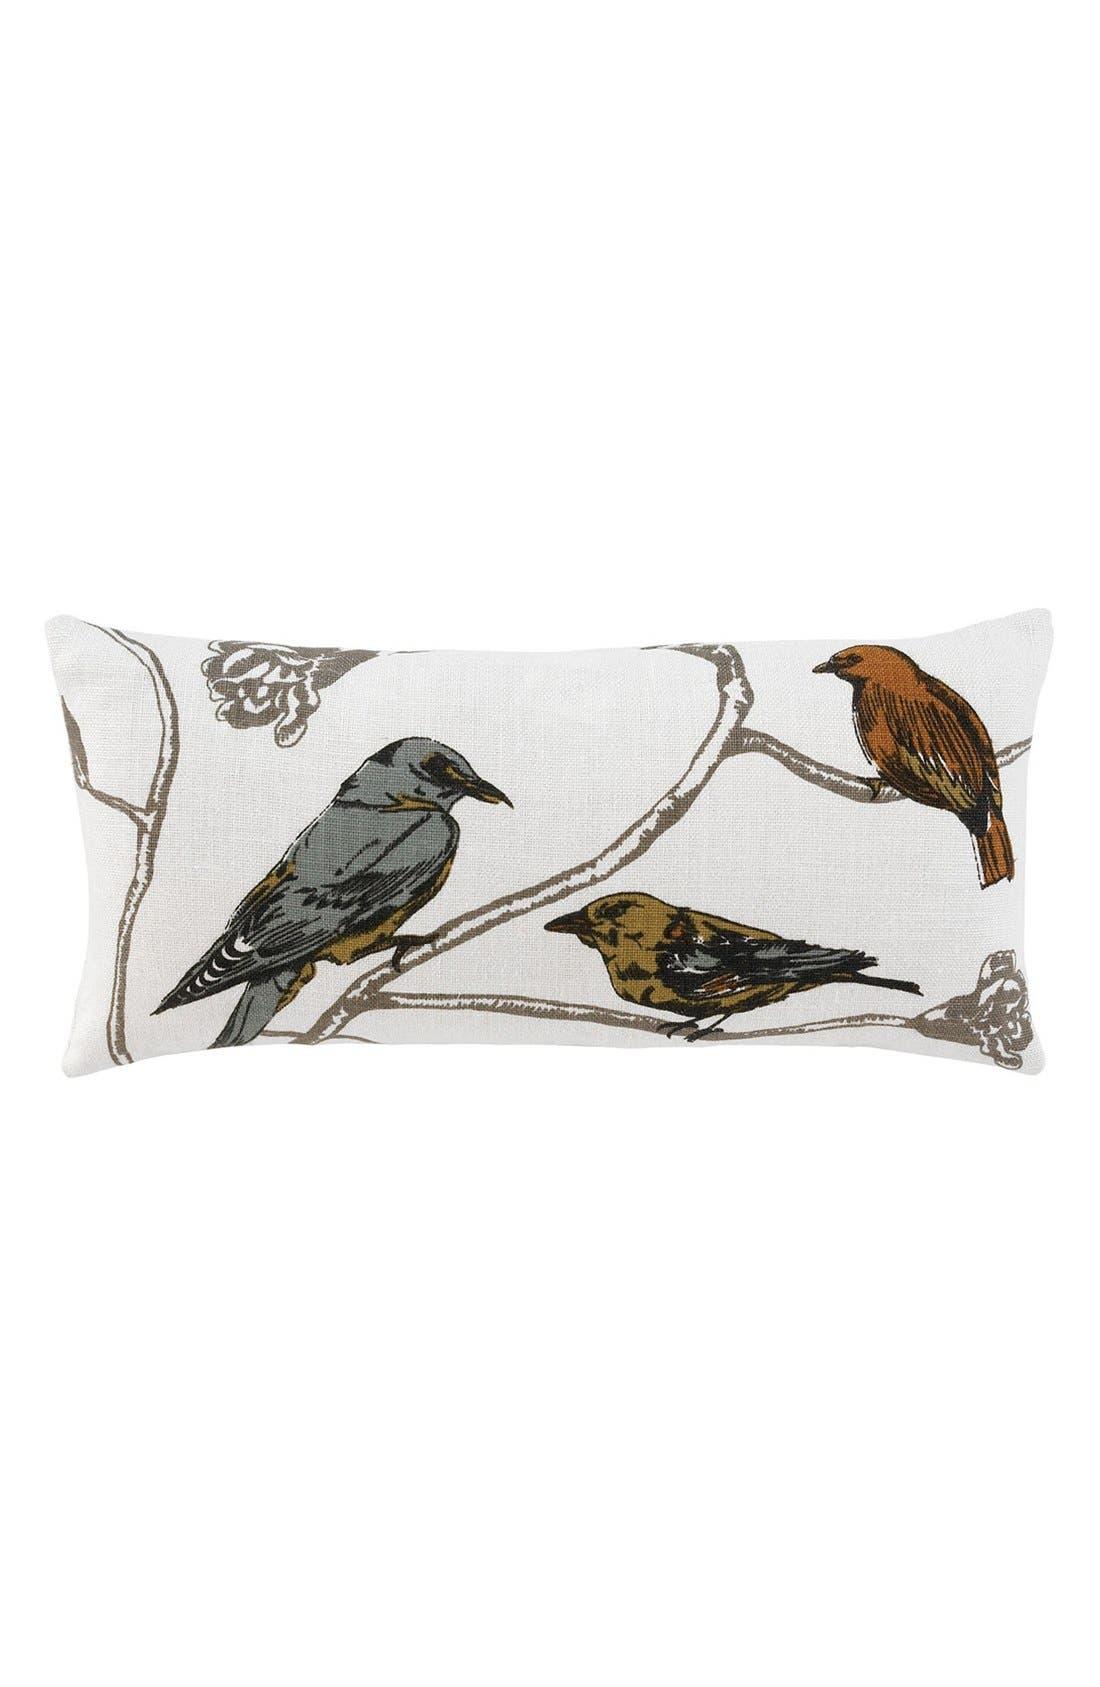 Alternate Image 1 Selected - DwellStudio 'Chinoiserie' Decorative Pillow